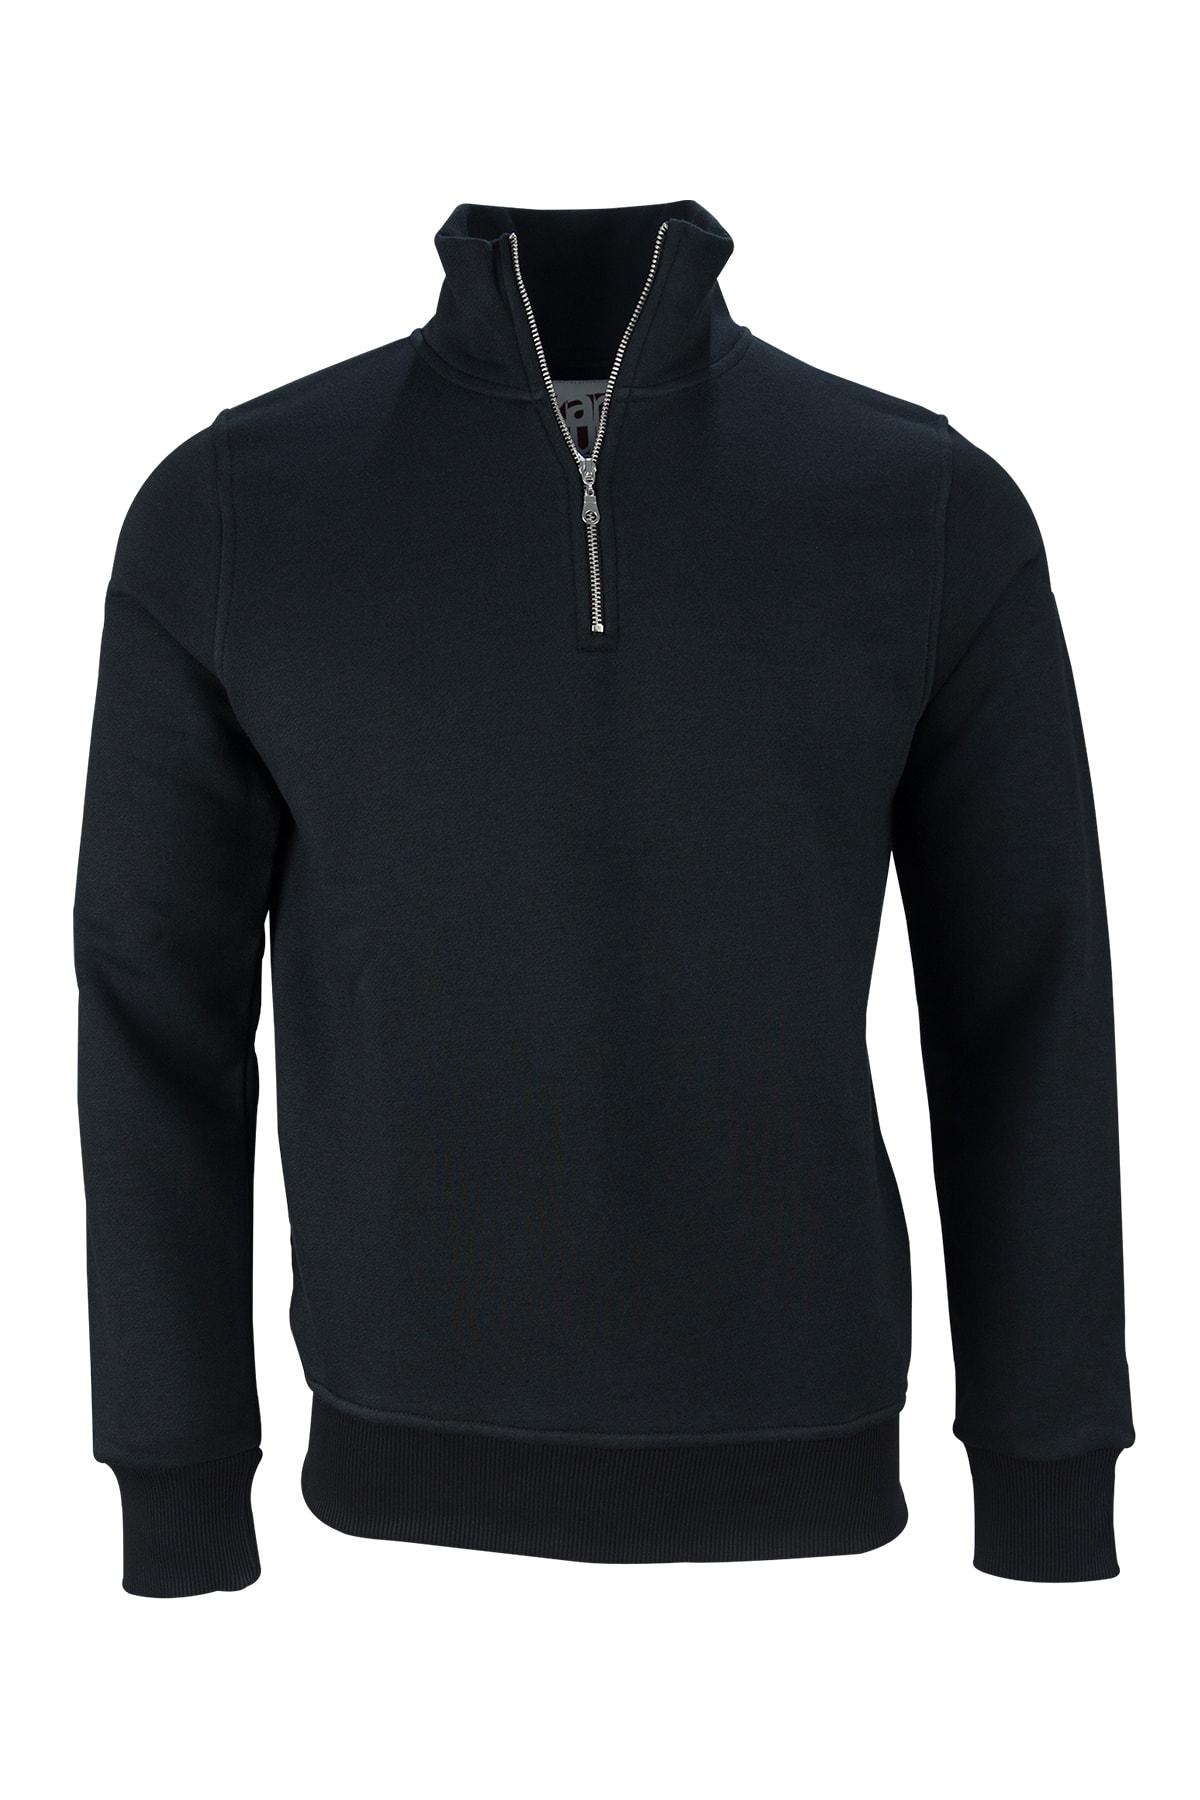 Fimerang Diagonal Yarım Fermuarlı Sweatshirt 2